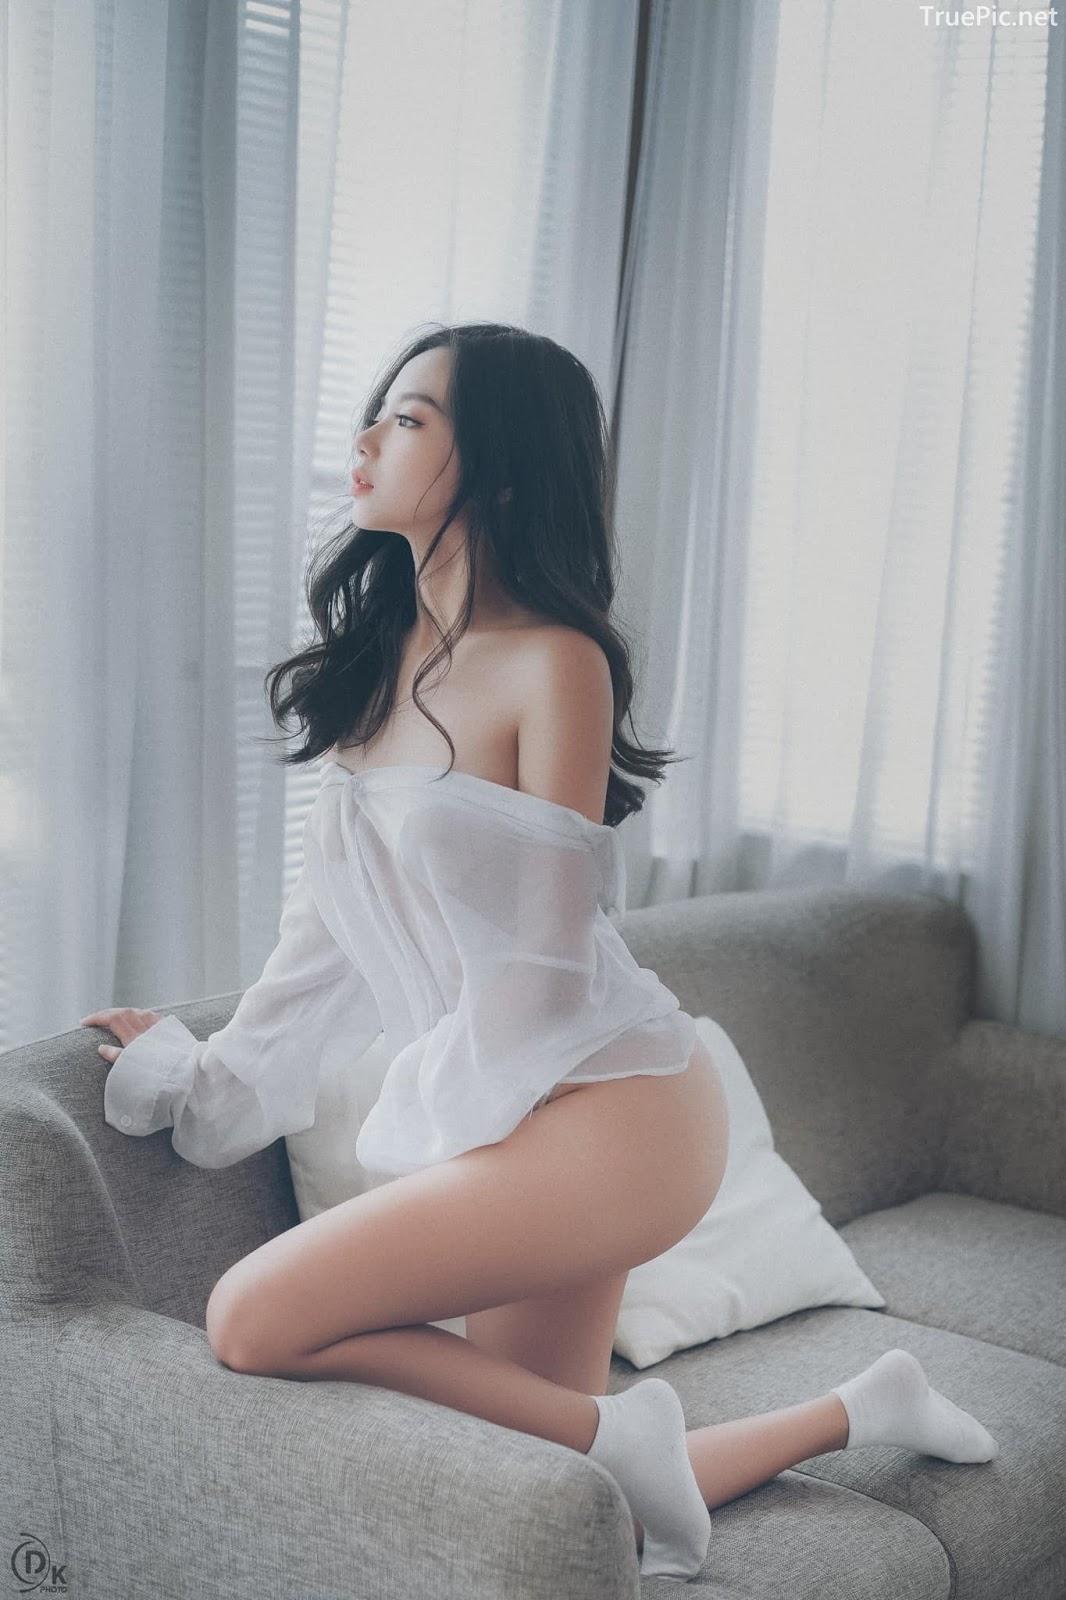 Vietnamese Sexy Model - Vu Ngoc Kim Chi - Beautiful in white - TruePic.net- Picture 15